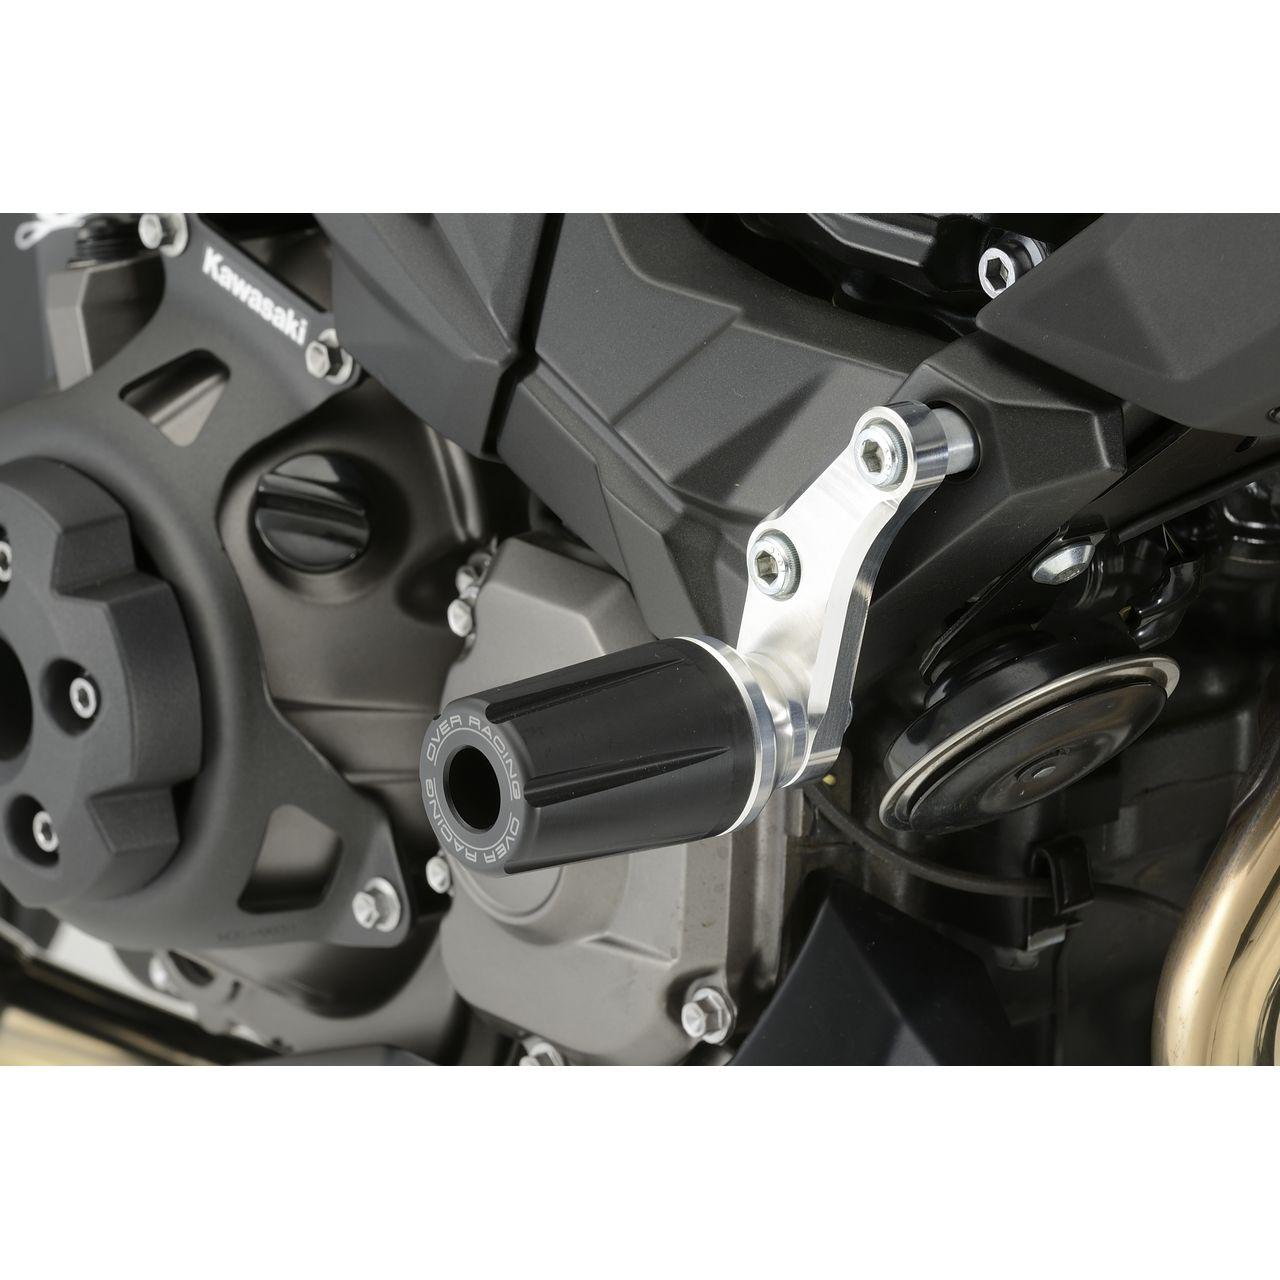 【OVER】引擎滑塊(防倒球) - 「Webike-摩托百貨」